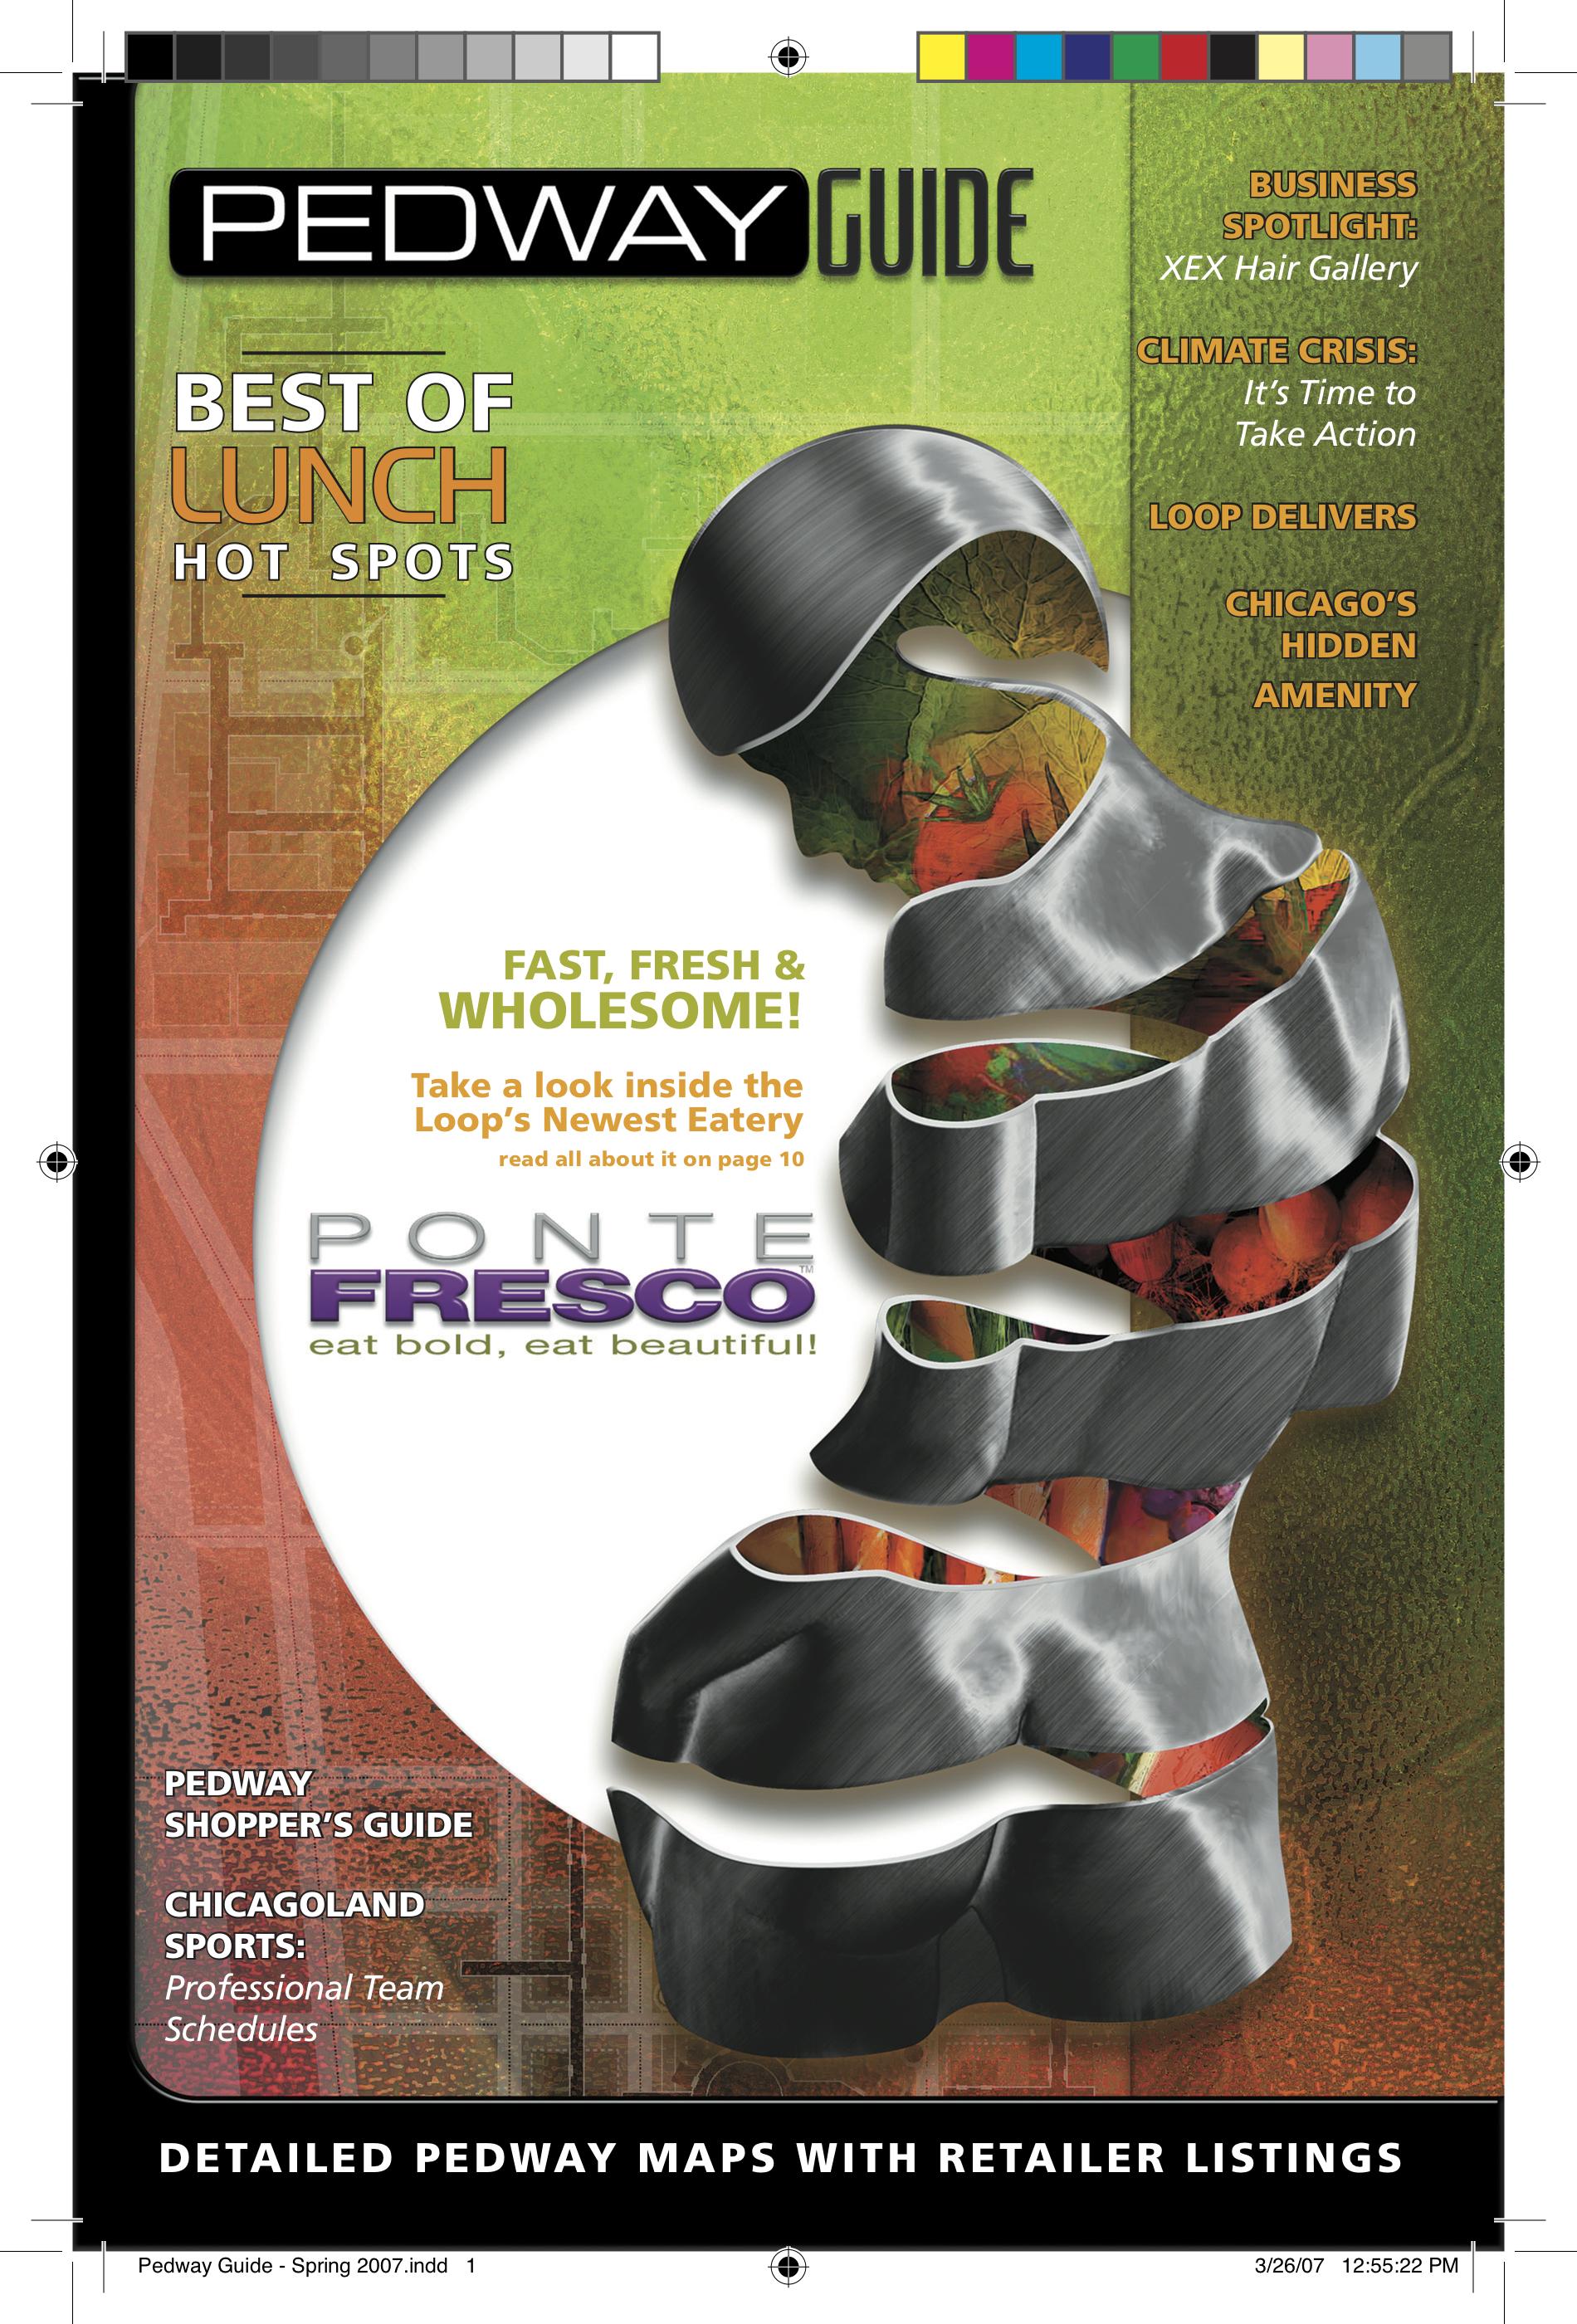 Click Pedway Guid below for PDF of Ponte Fresco coverstory